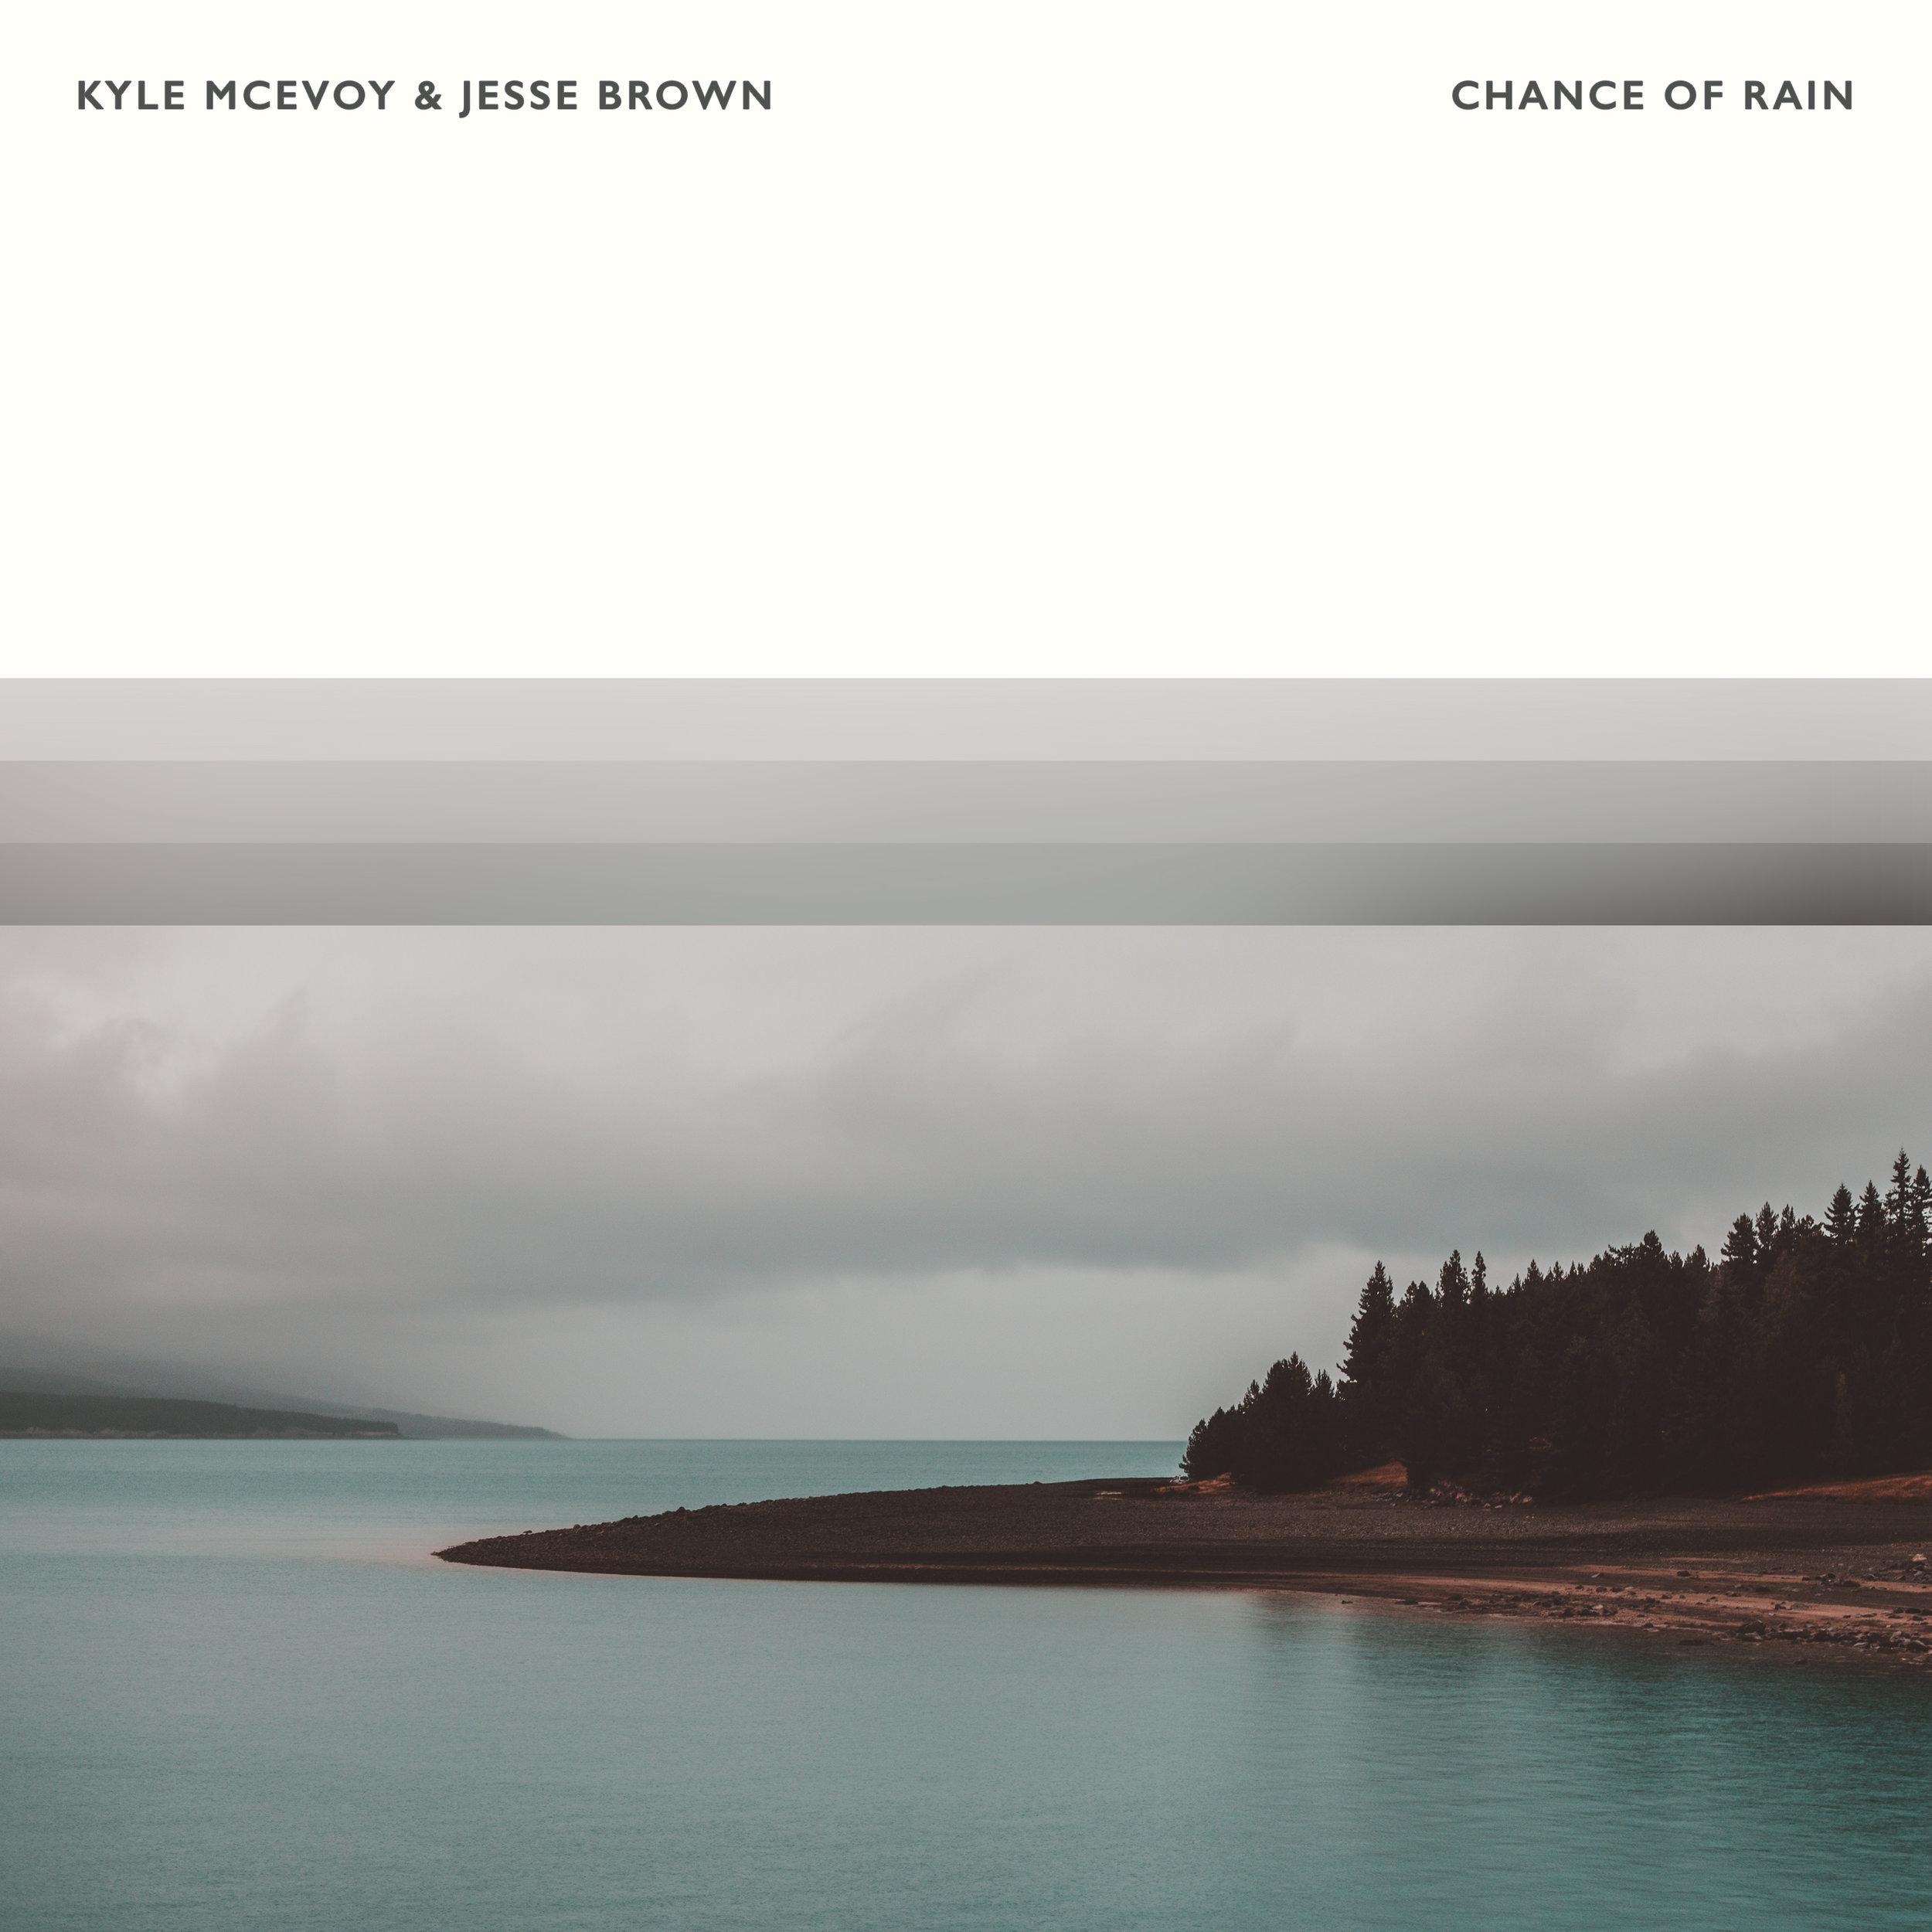 Kyle McEvoy & Jesse Brown - Chance Of Rain